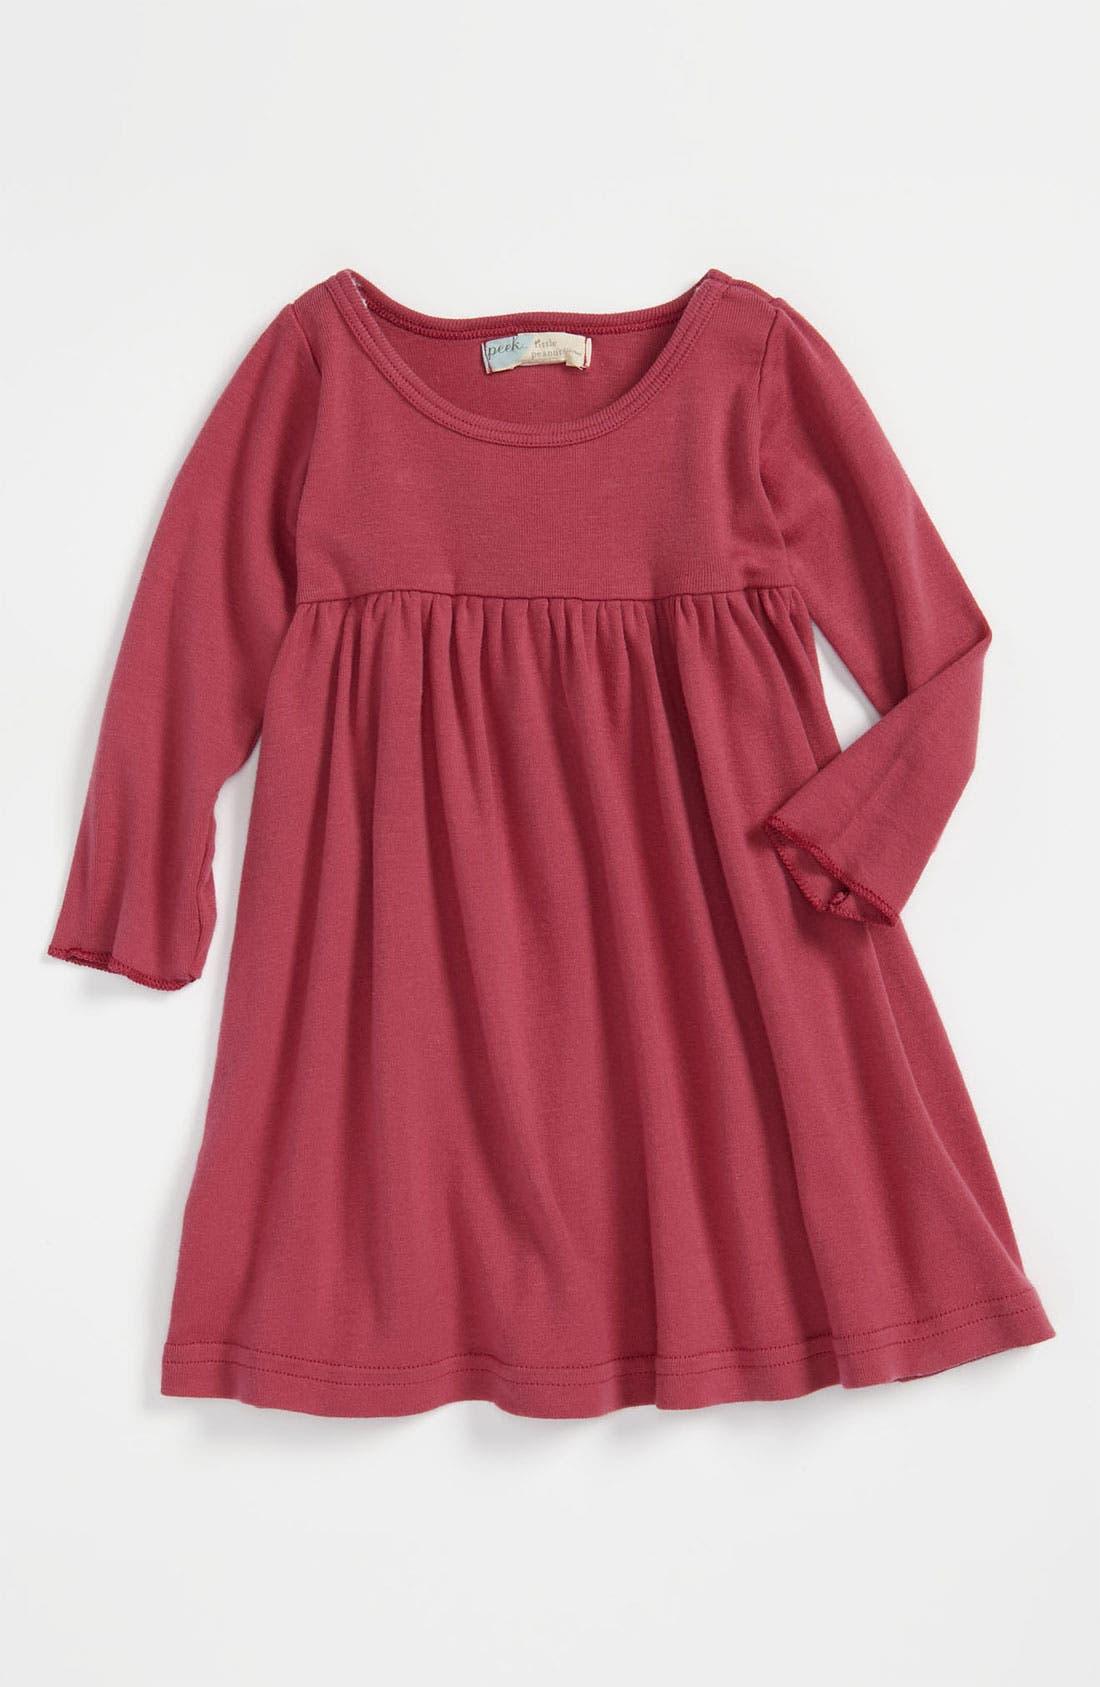 Alternate Image 1 Selected - Peek Long Sleeve Dress (Infant)